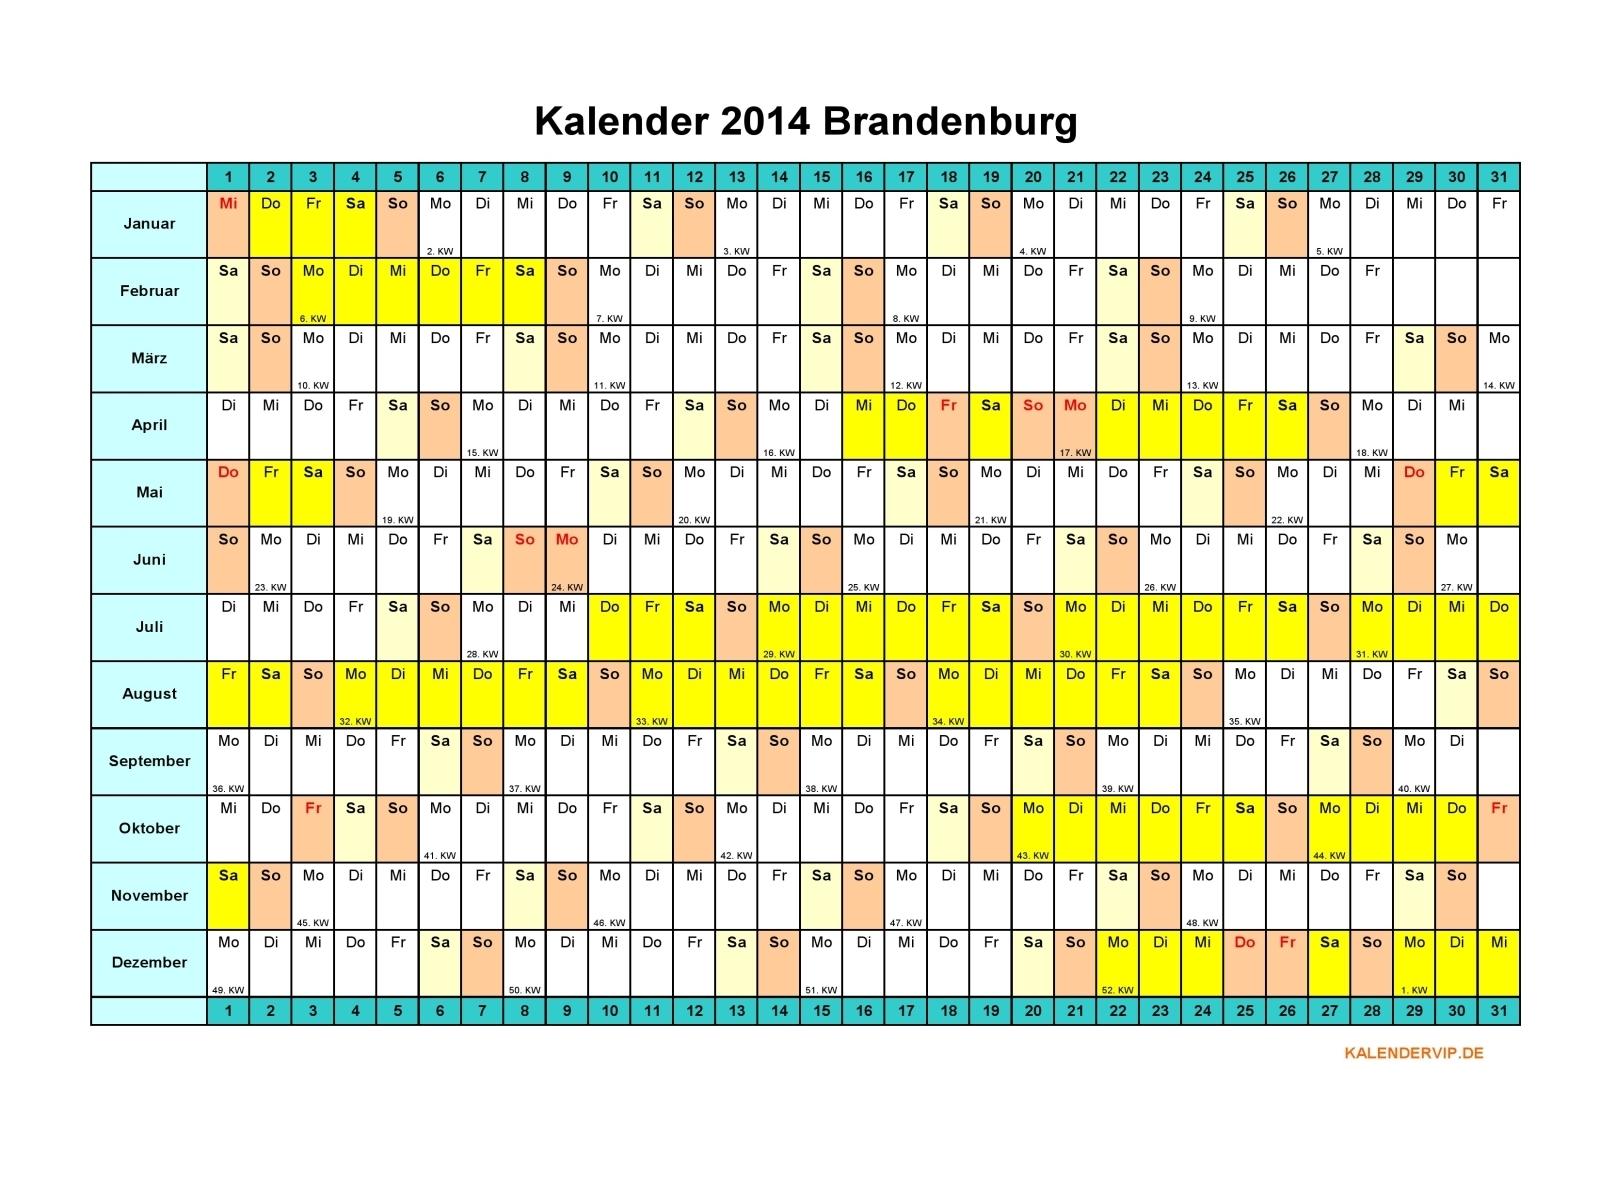 Kalender 2014 Brandenburg - KalenderVIP